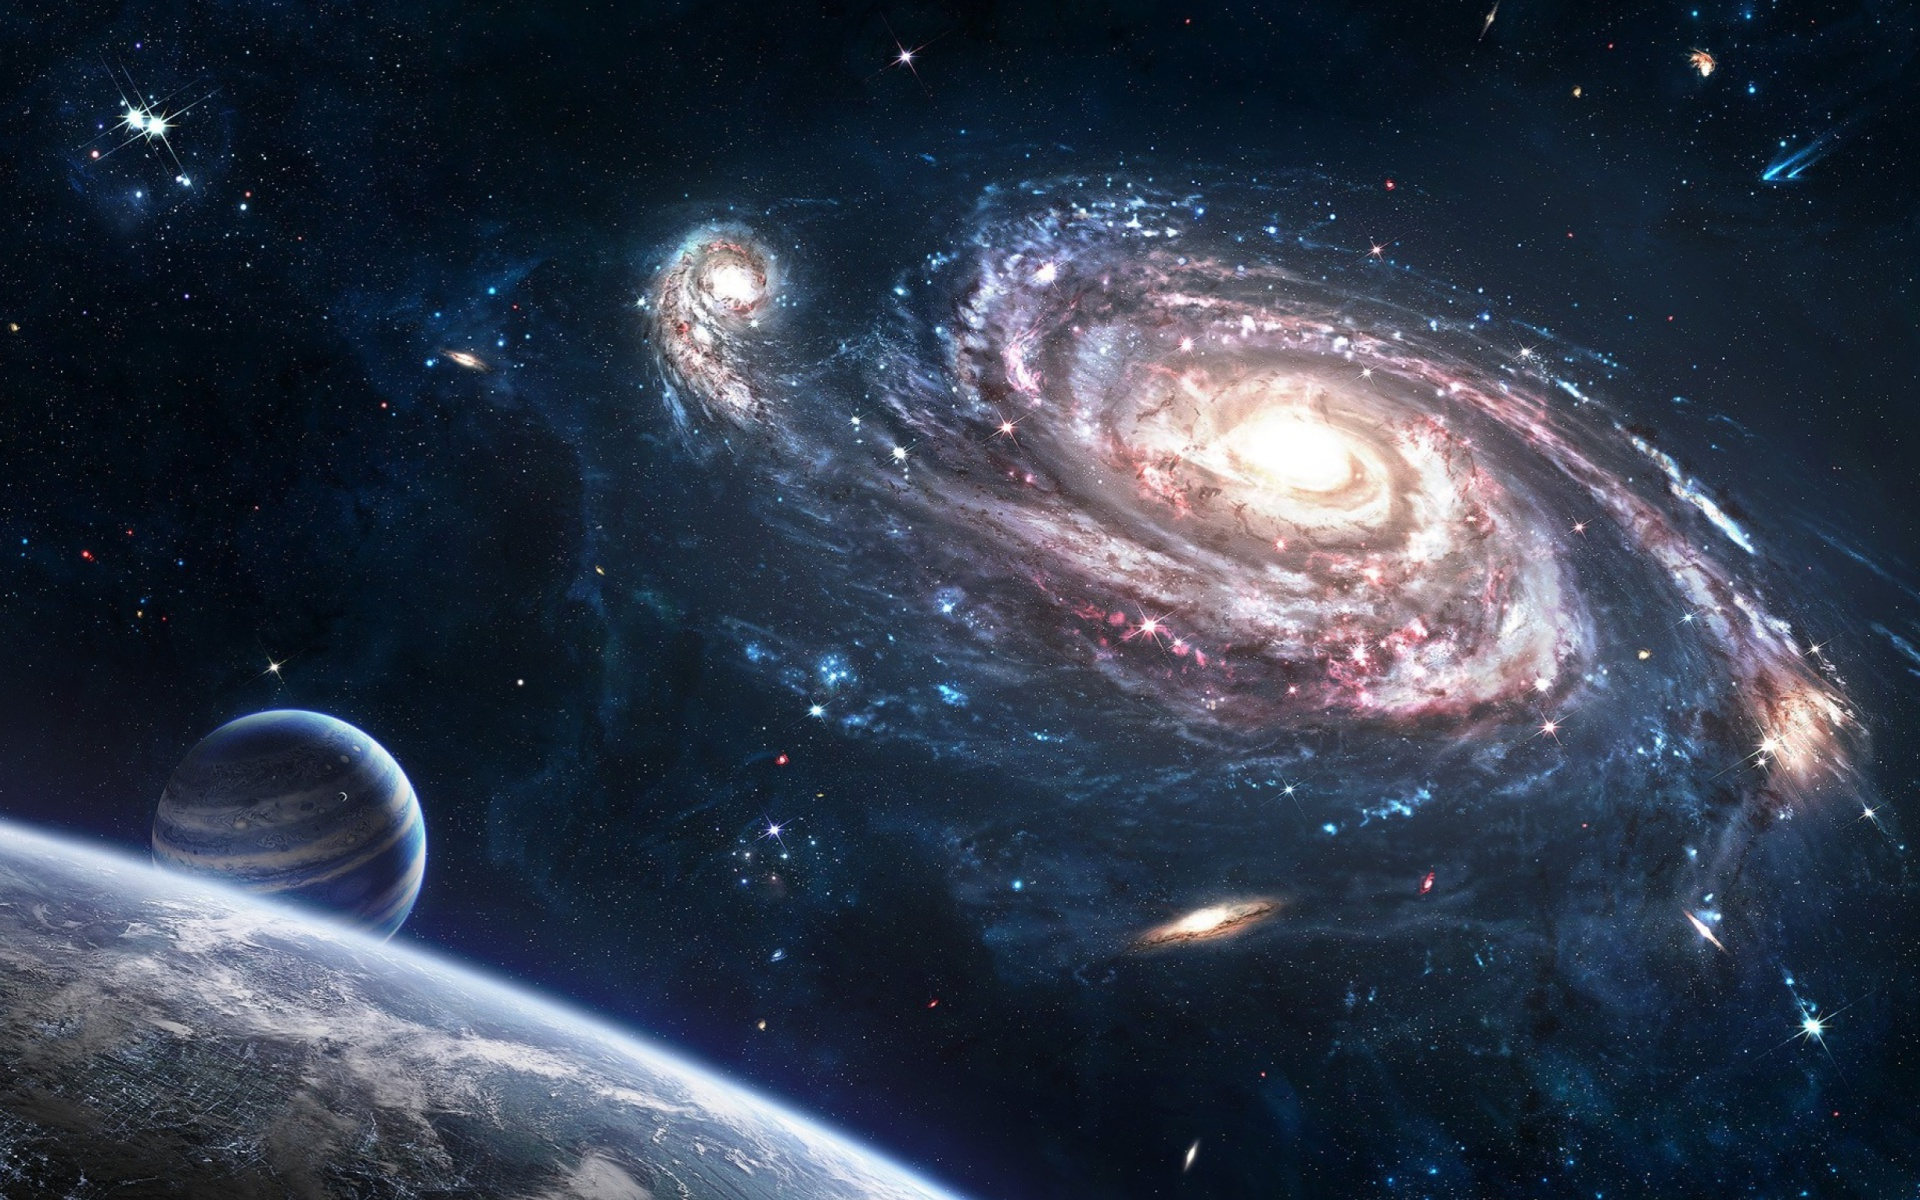 Milky Way Galaxy Wallpapers Free Download | PixelsTalk Net